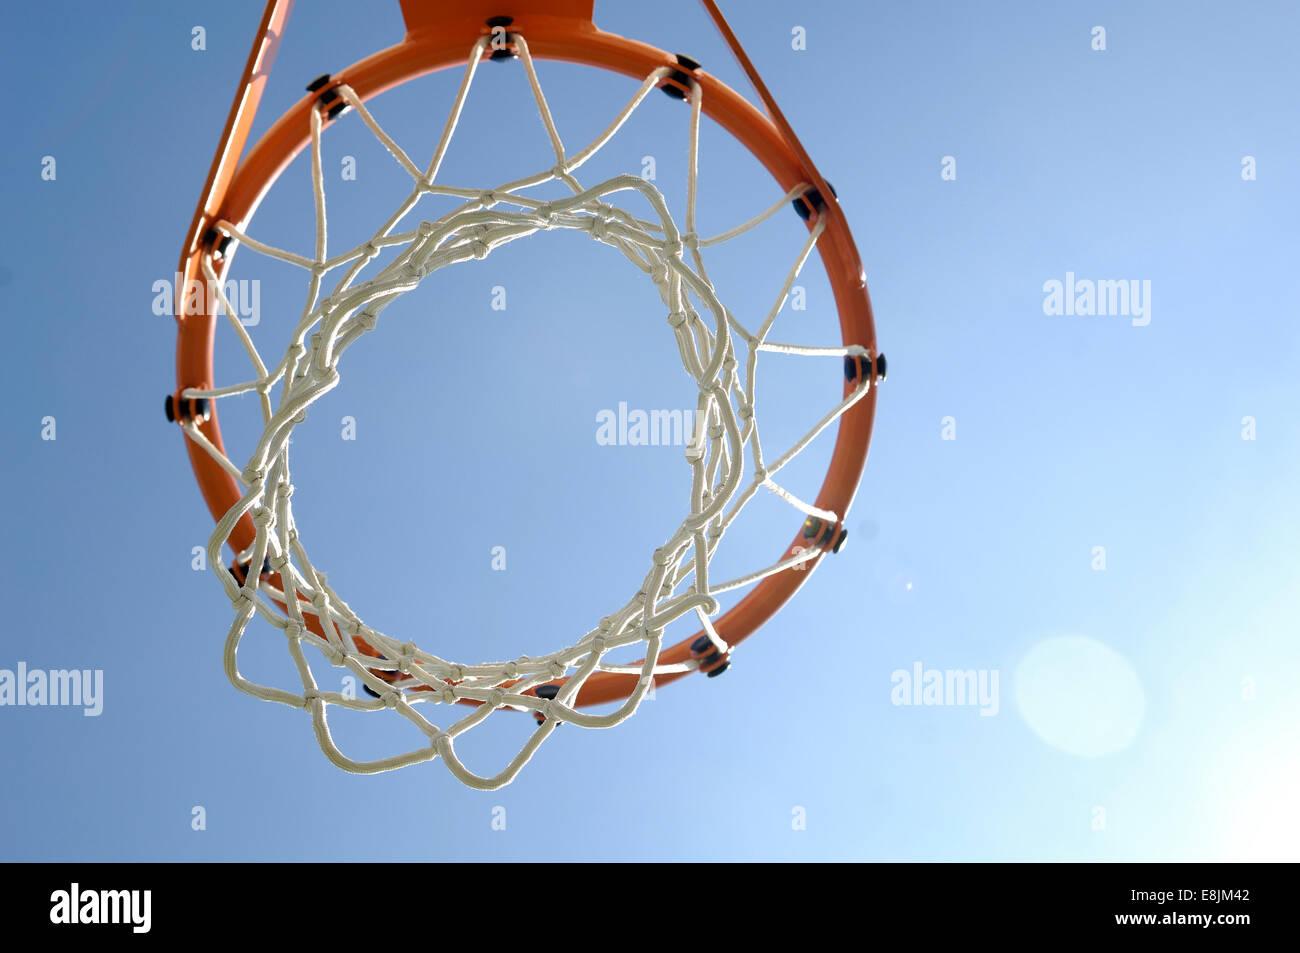 sports - Stock Image